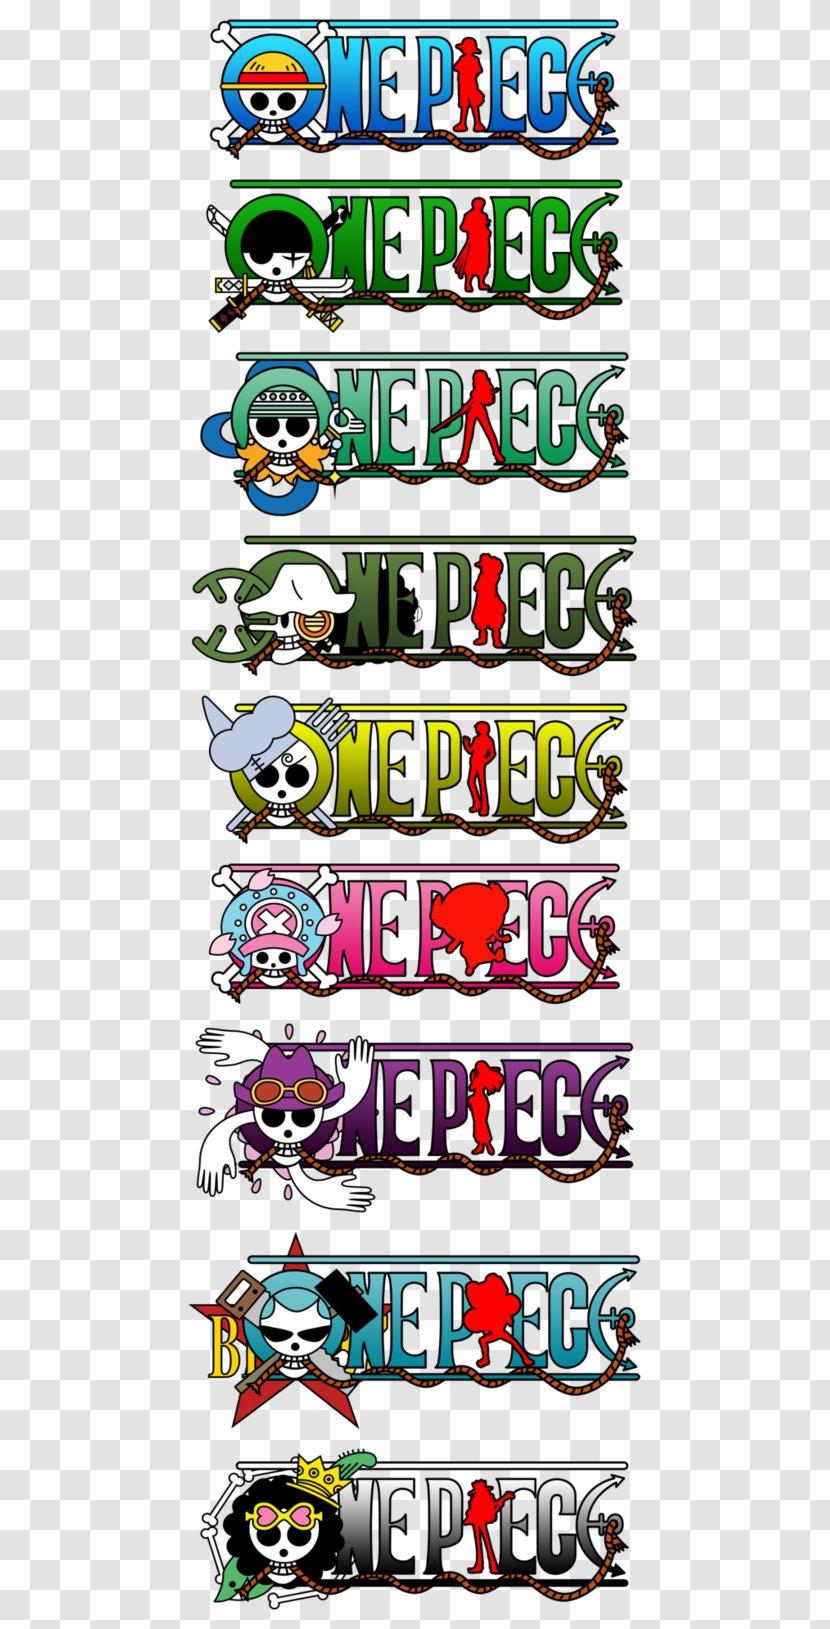 Monkey D Luffy Usopp Vinsmoke Sanji Roronoa Zoro Nami Logo One Piece Transparent Png